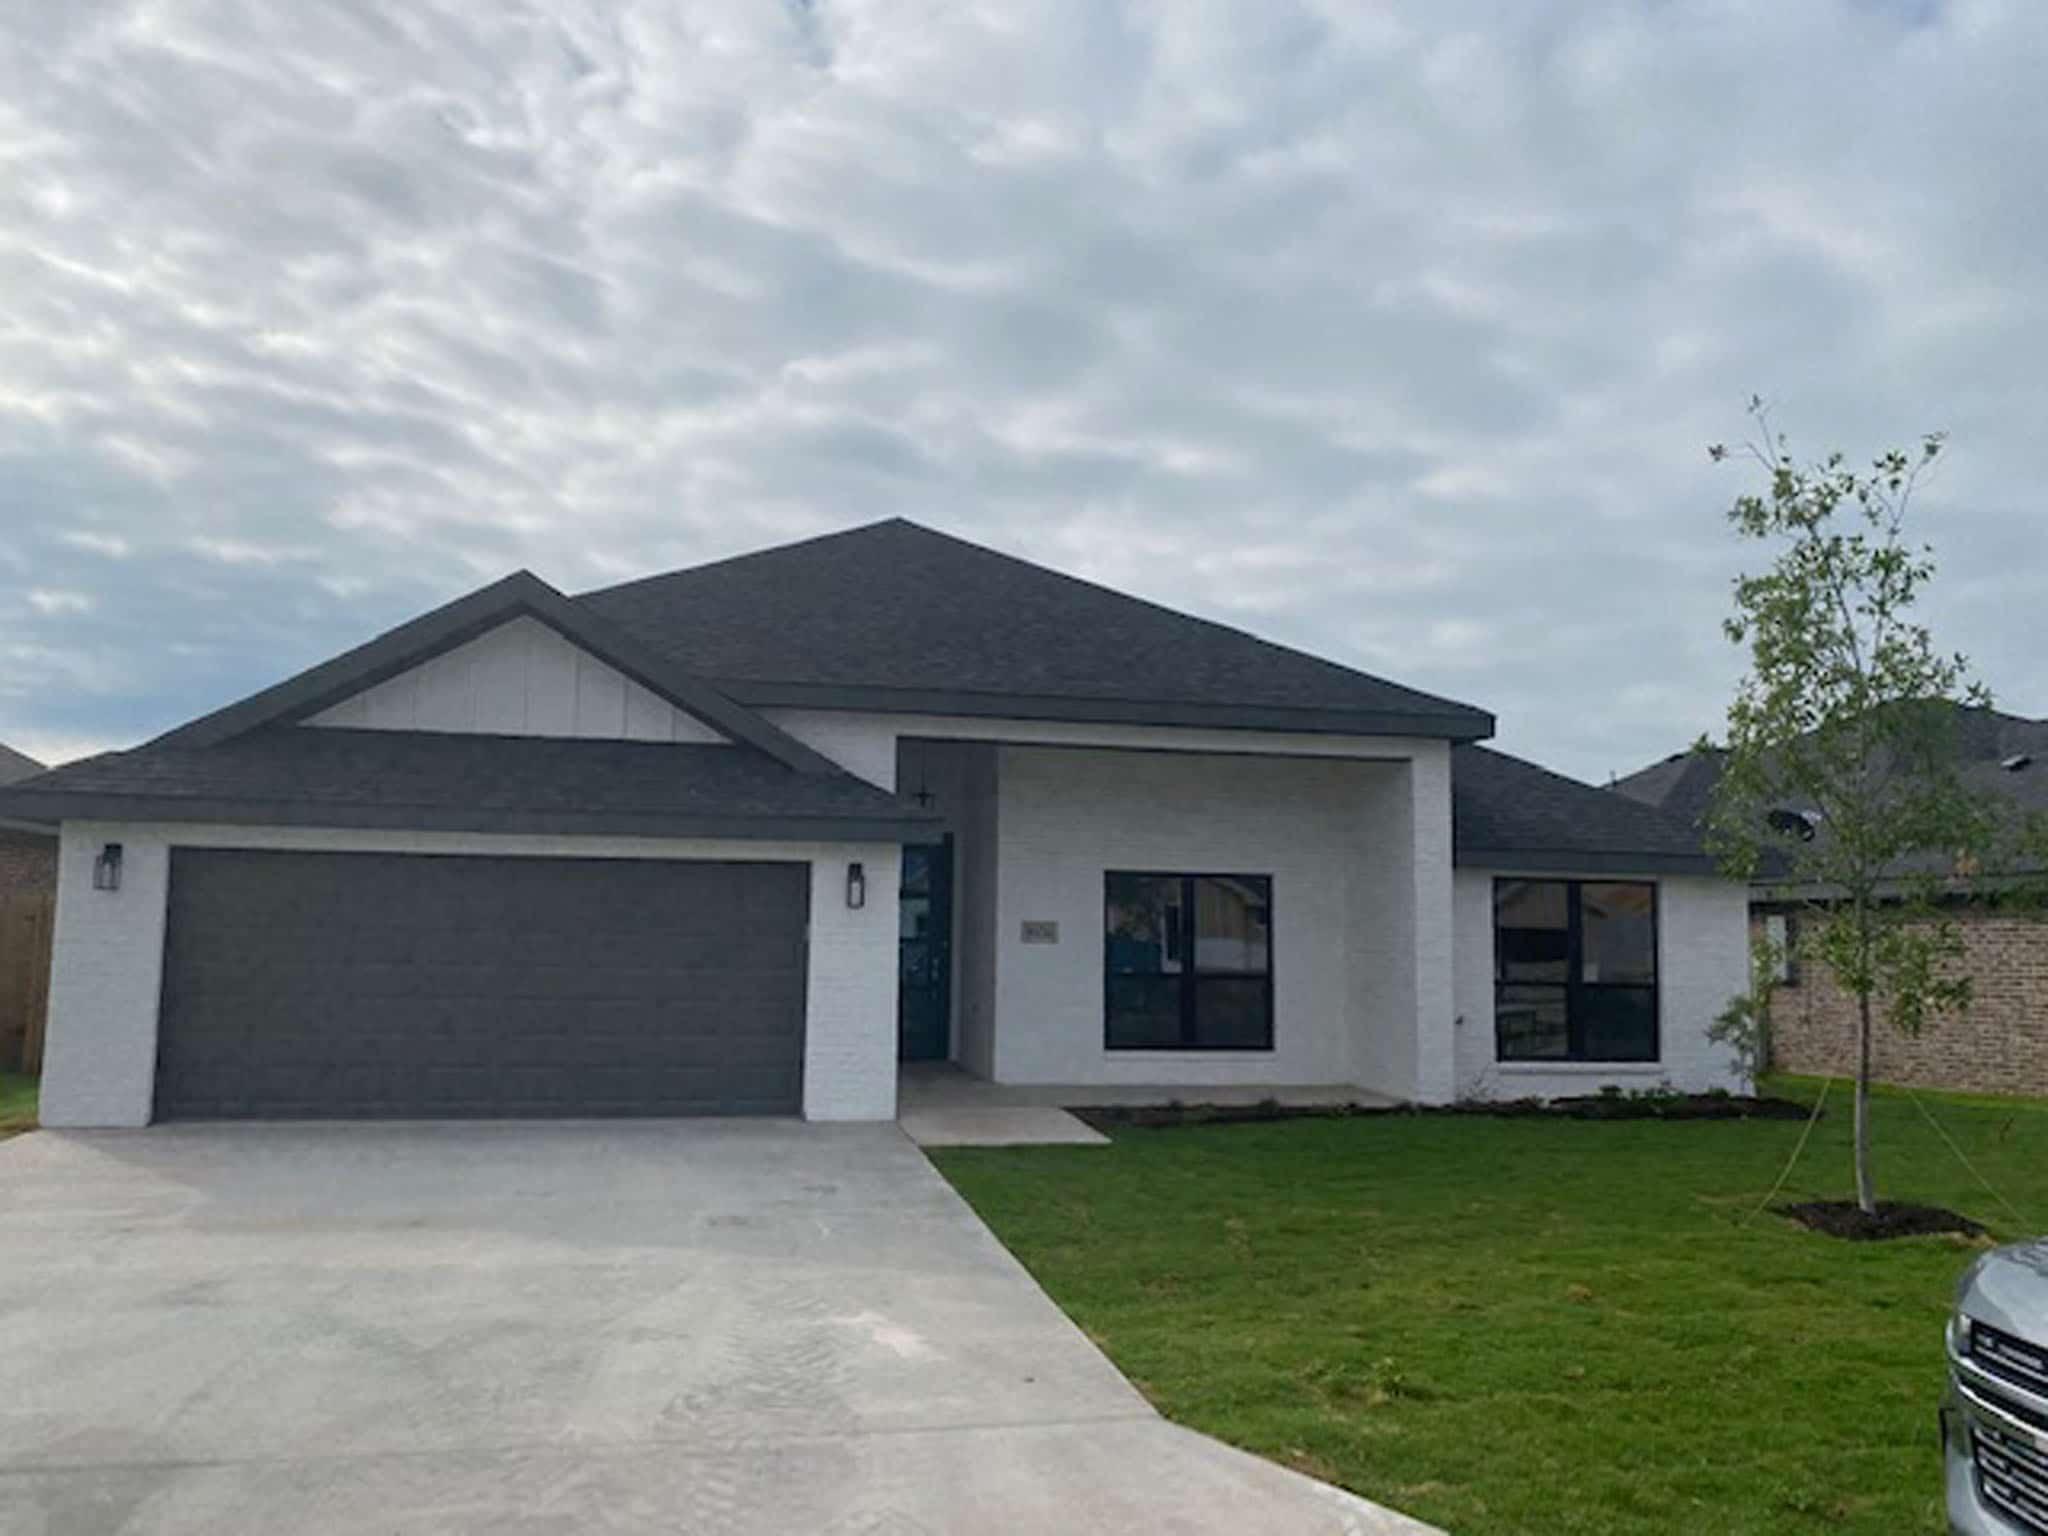 San Angelo Custom Home Builder - 5934 Merrick St, San Angelo TX 76904